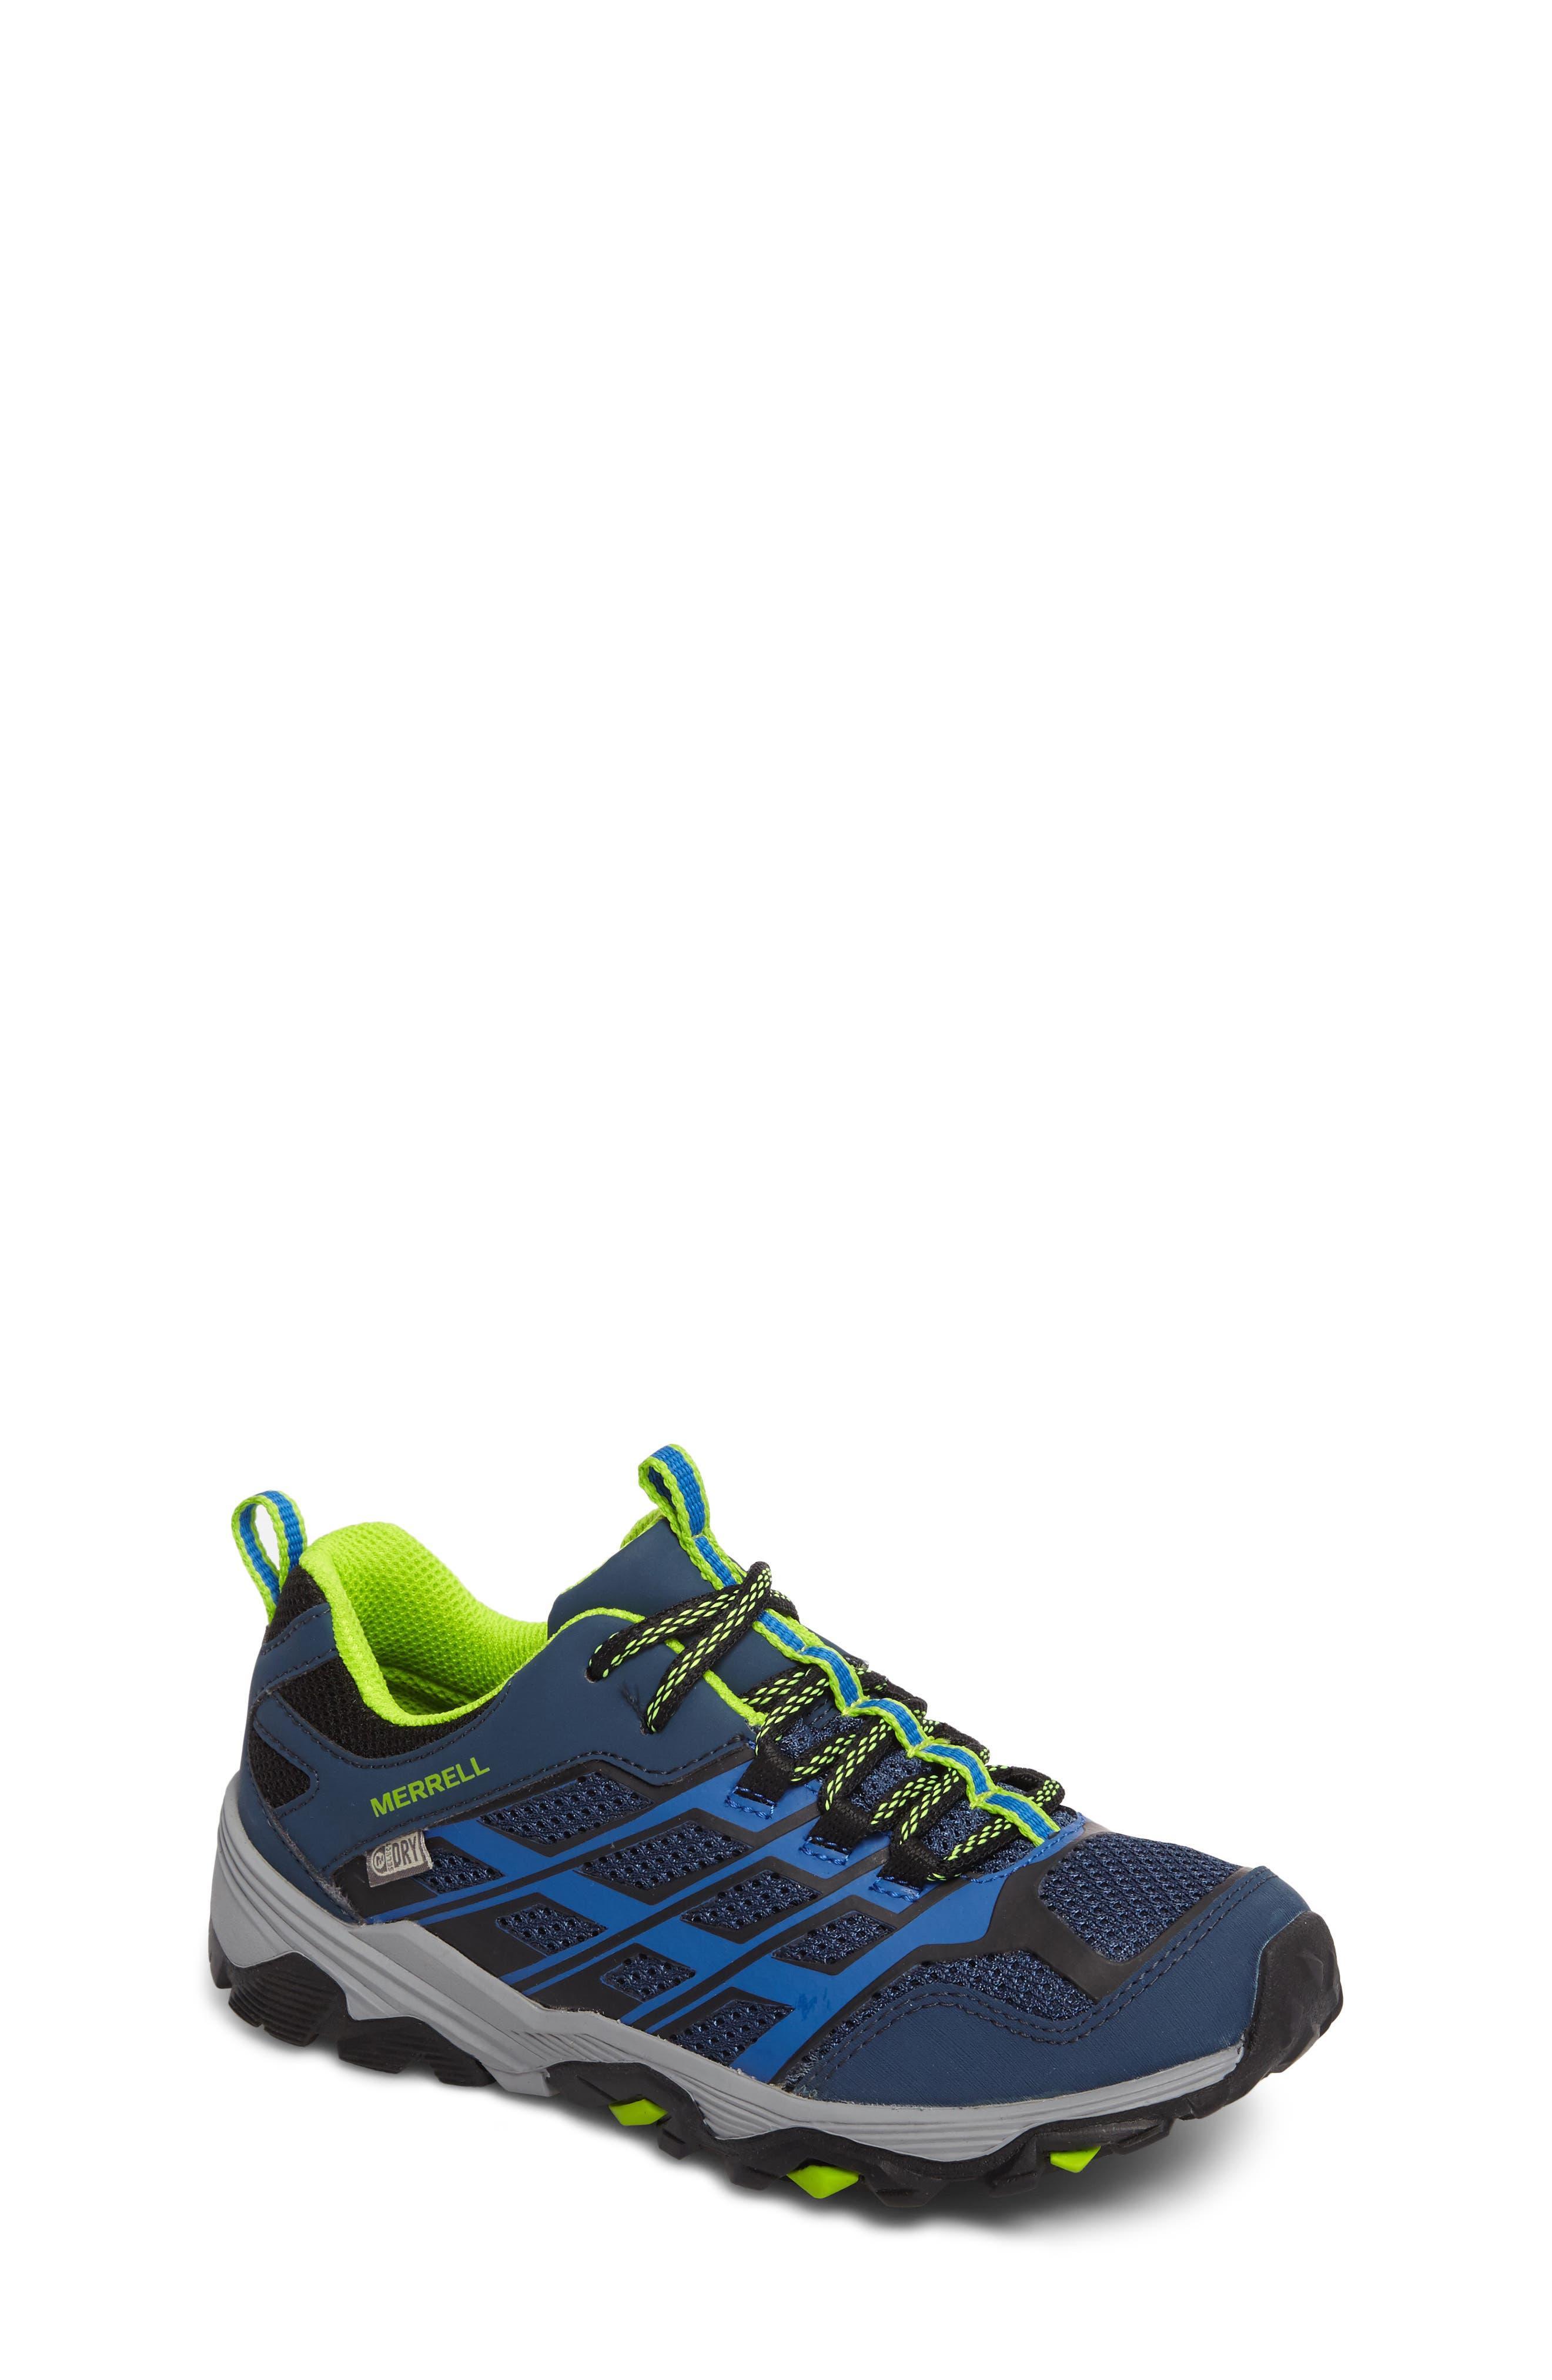 Moab FST Polar Low Waterproof Sneaker,                             Main thumbnail 1, color,                             NAVY/ BLUE